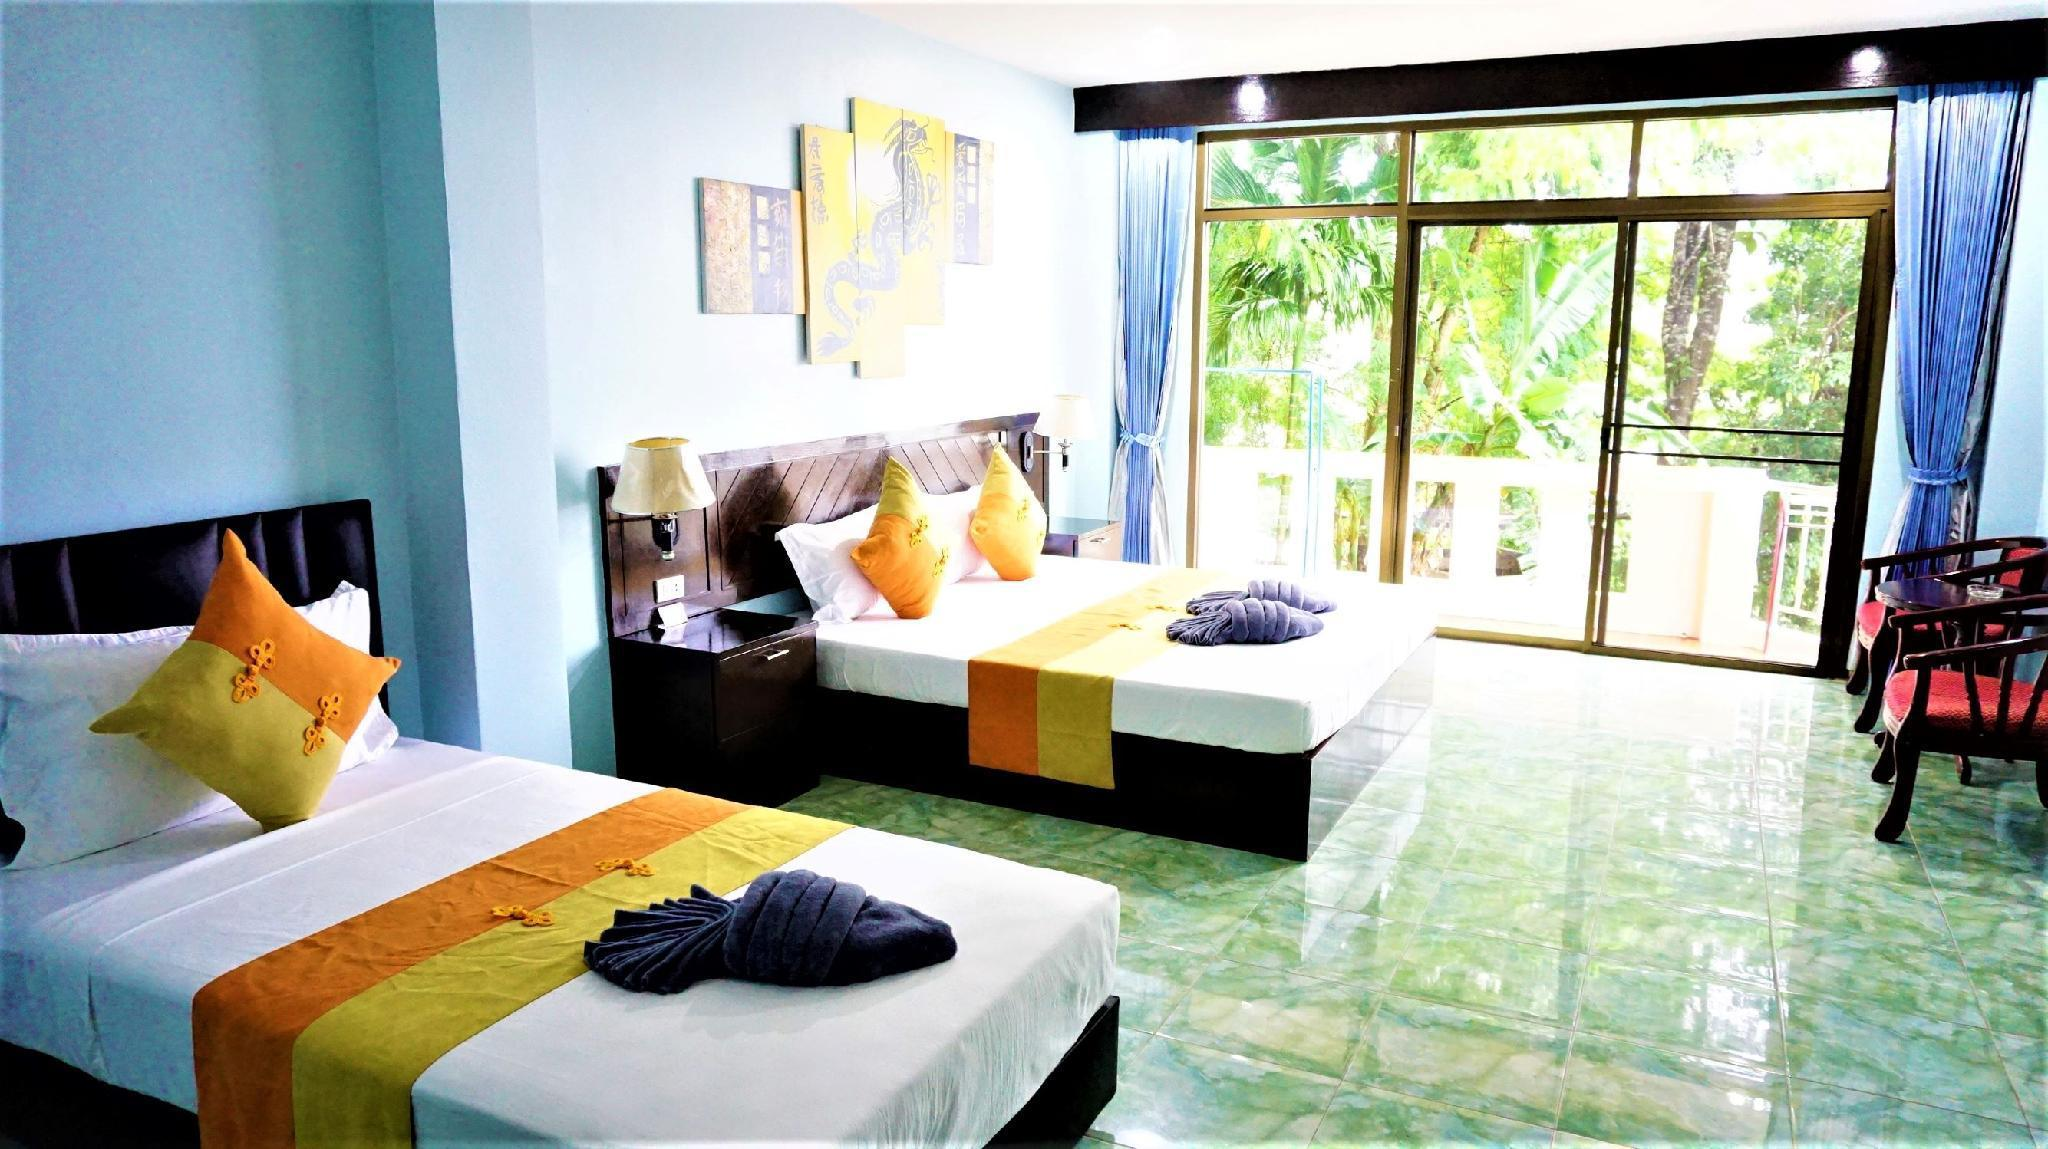 Romantic Family Room with balcony in Patong Beach วิลลา 1 ห้องนอน 1 ห้องน้ำส่วนตัว ขนาด 40 ตร.ม. – ป่าตอง